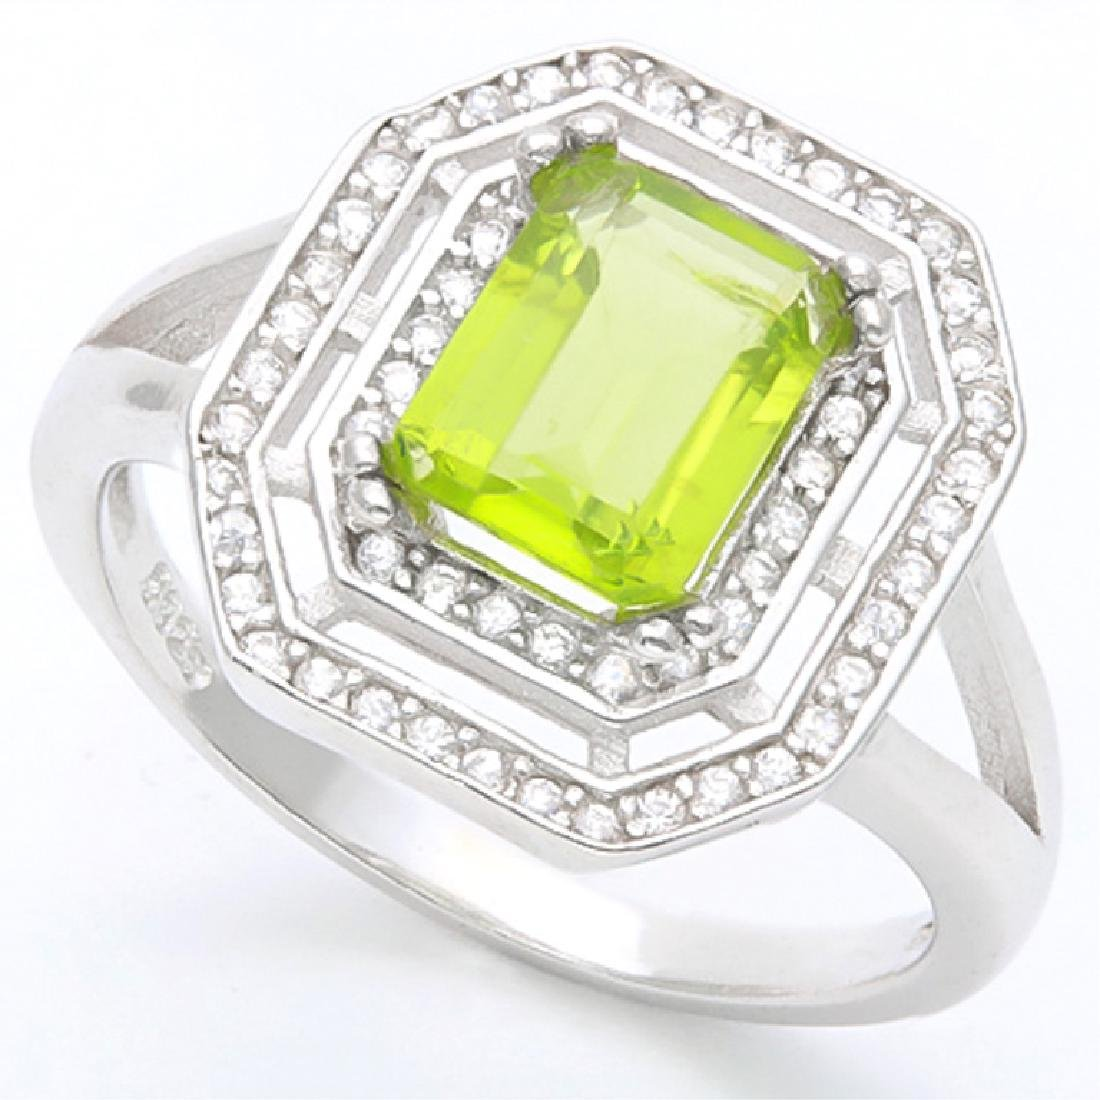 1CT ART DECO PERIDOT/DIAMOND STERLING RING